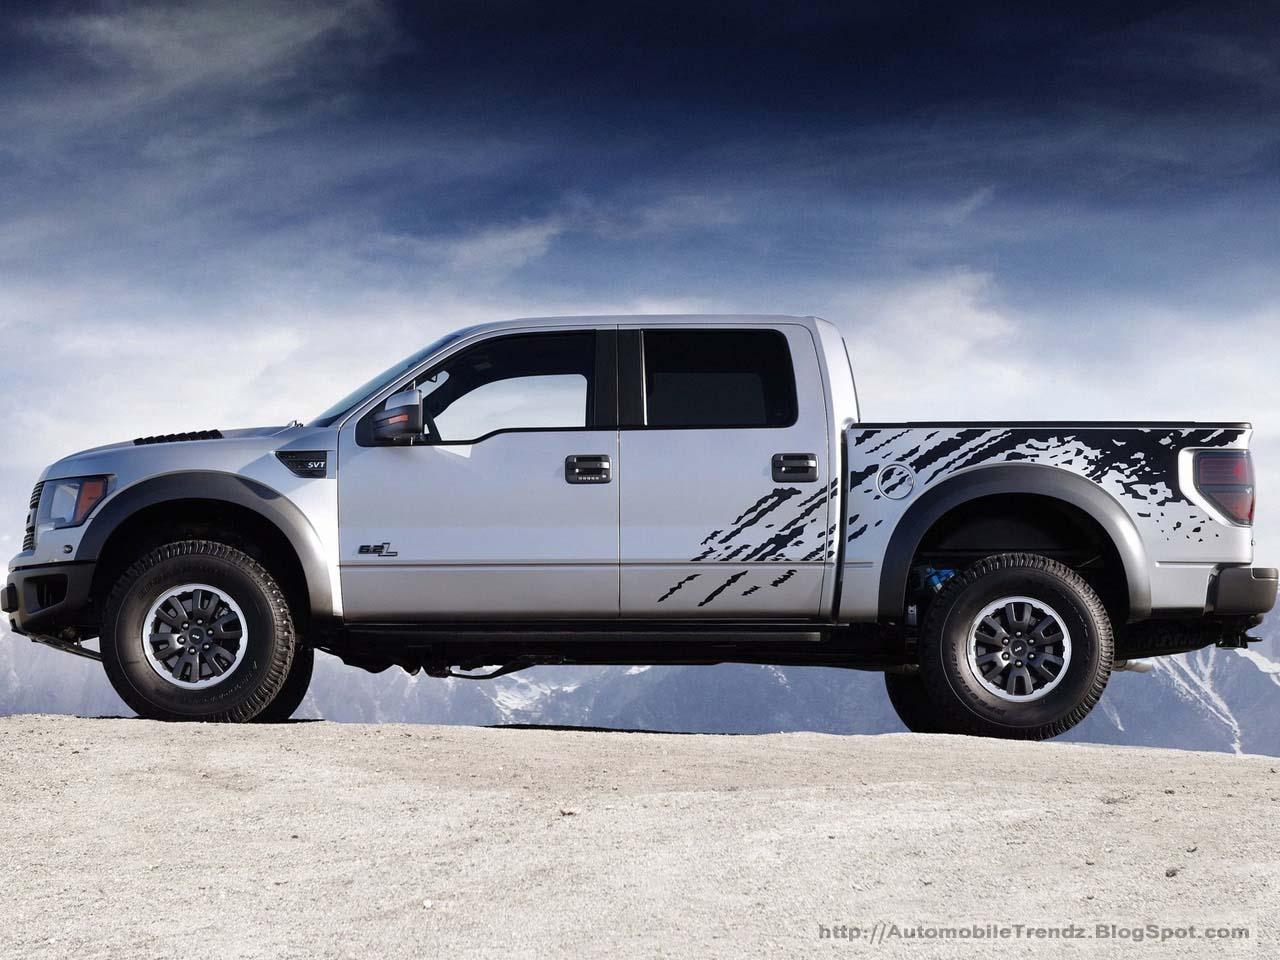 Black Ford Raptor 26 Free Wallpaper Hdblackwallpaper Com